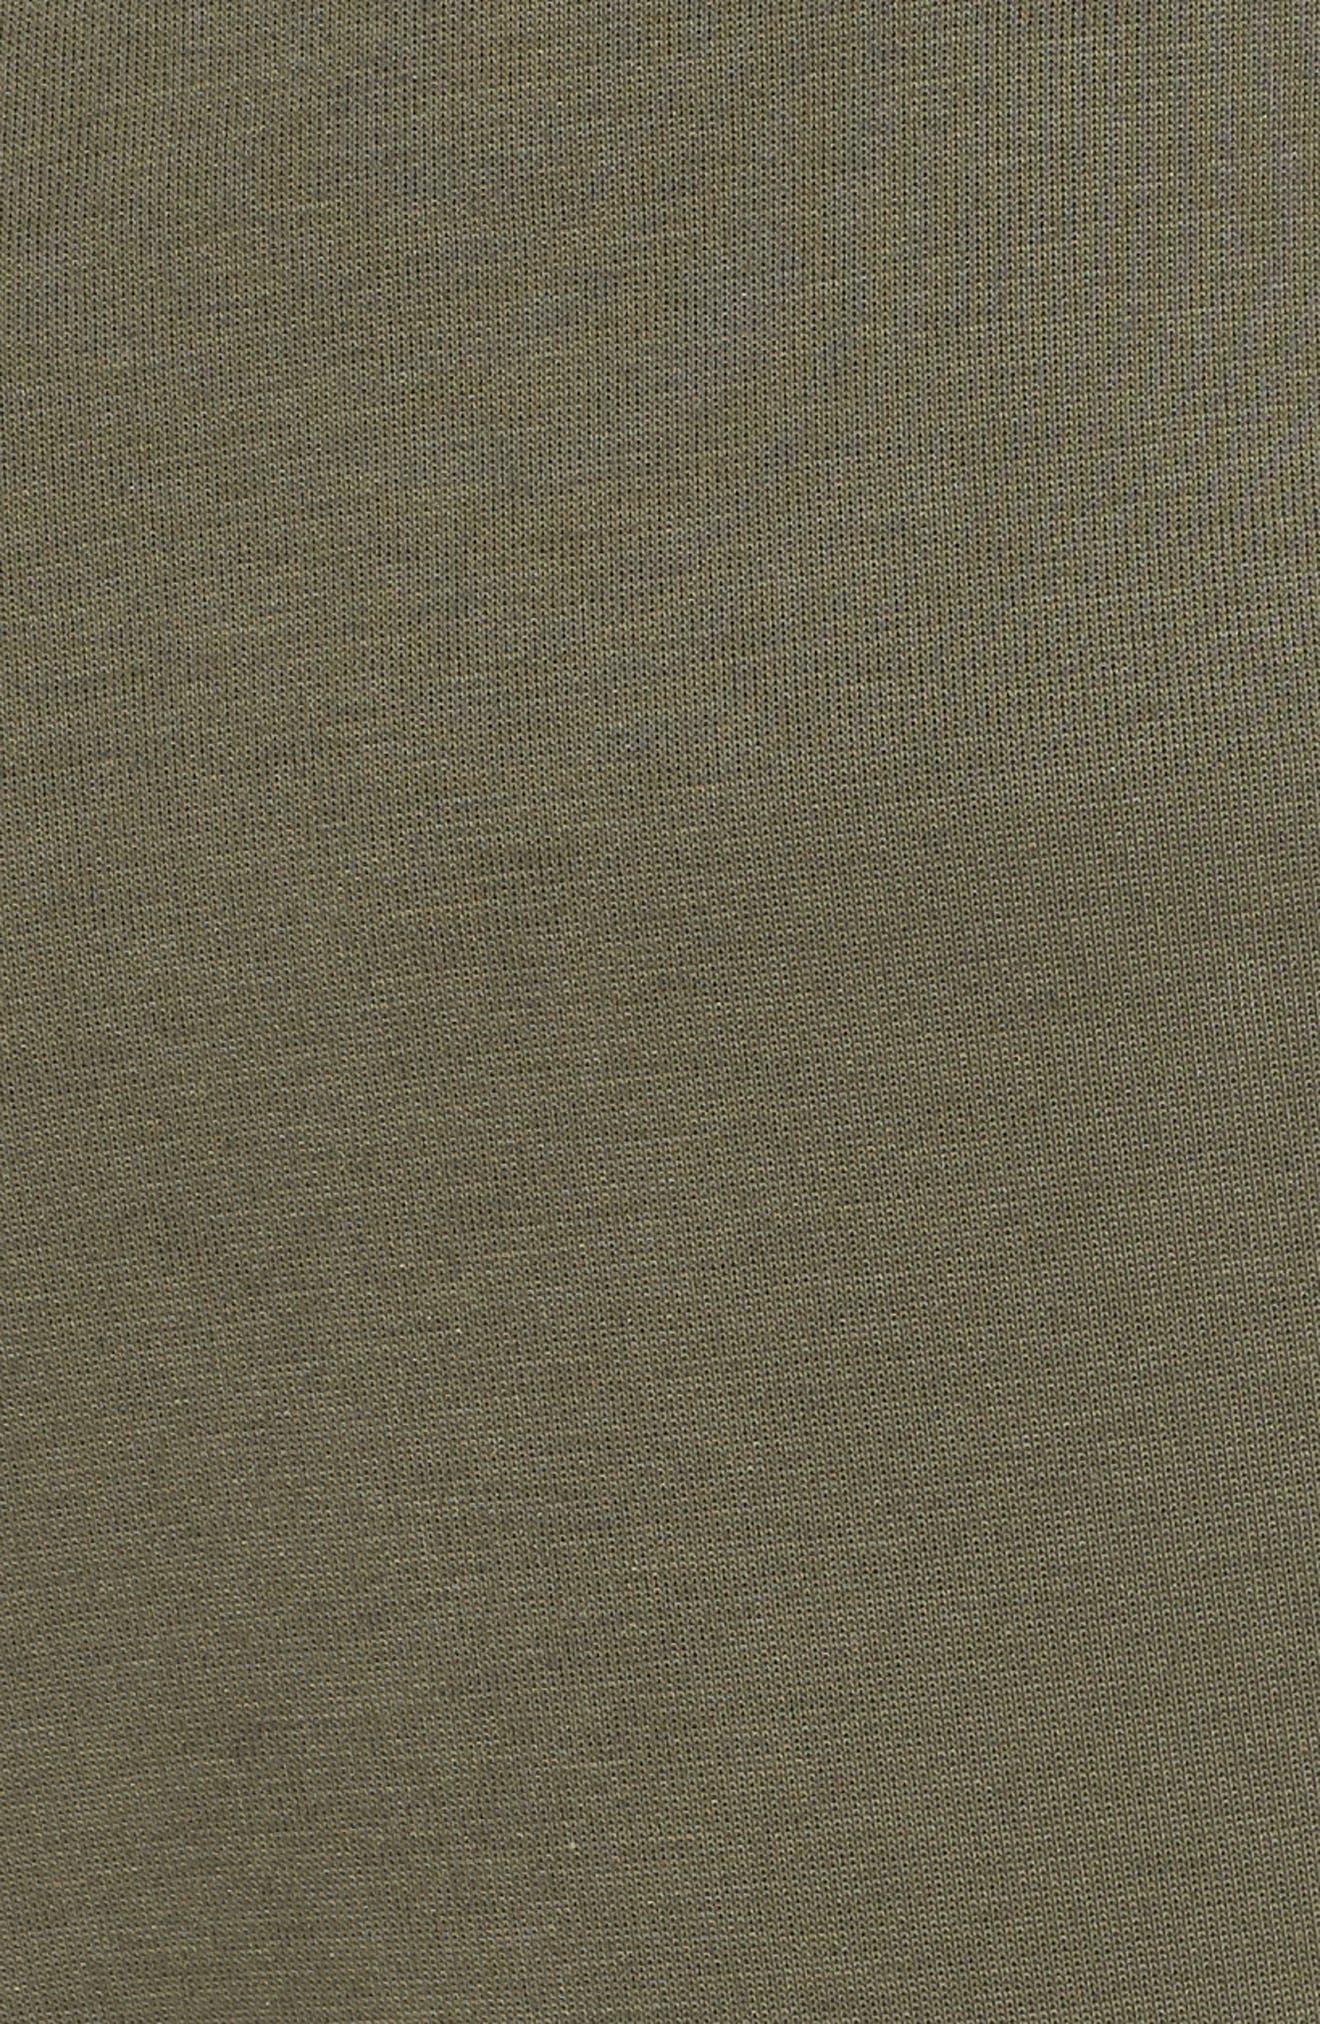 Tech Fleece Jogger Pants,                             Alternate thumbnail 5, color,                             BLACK/ TWILIGHT MARSH/ BLACK